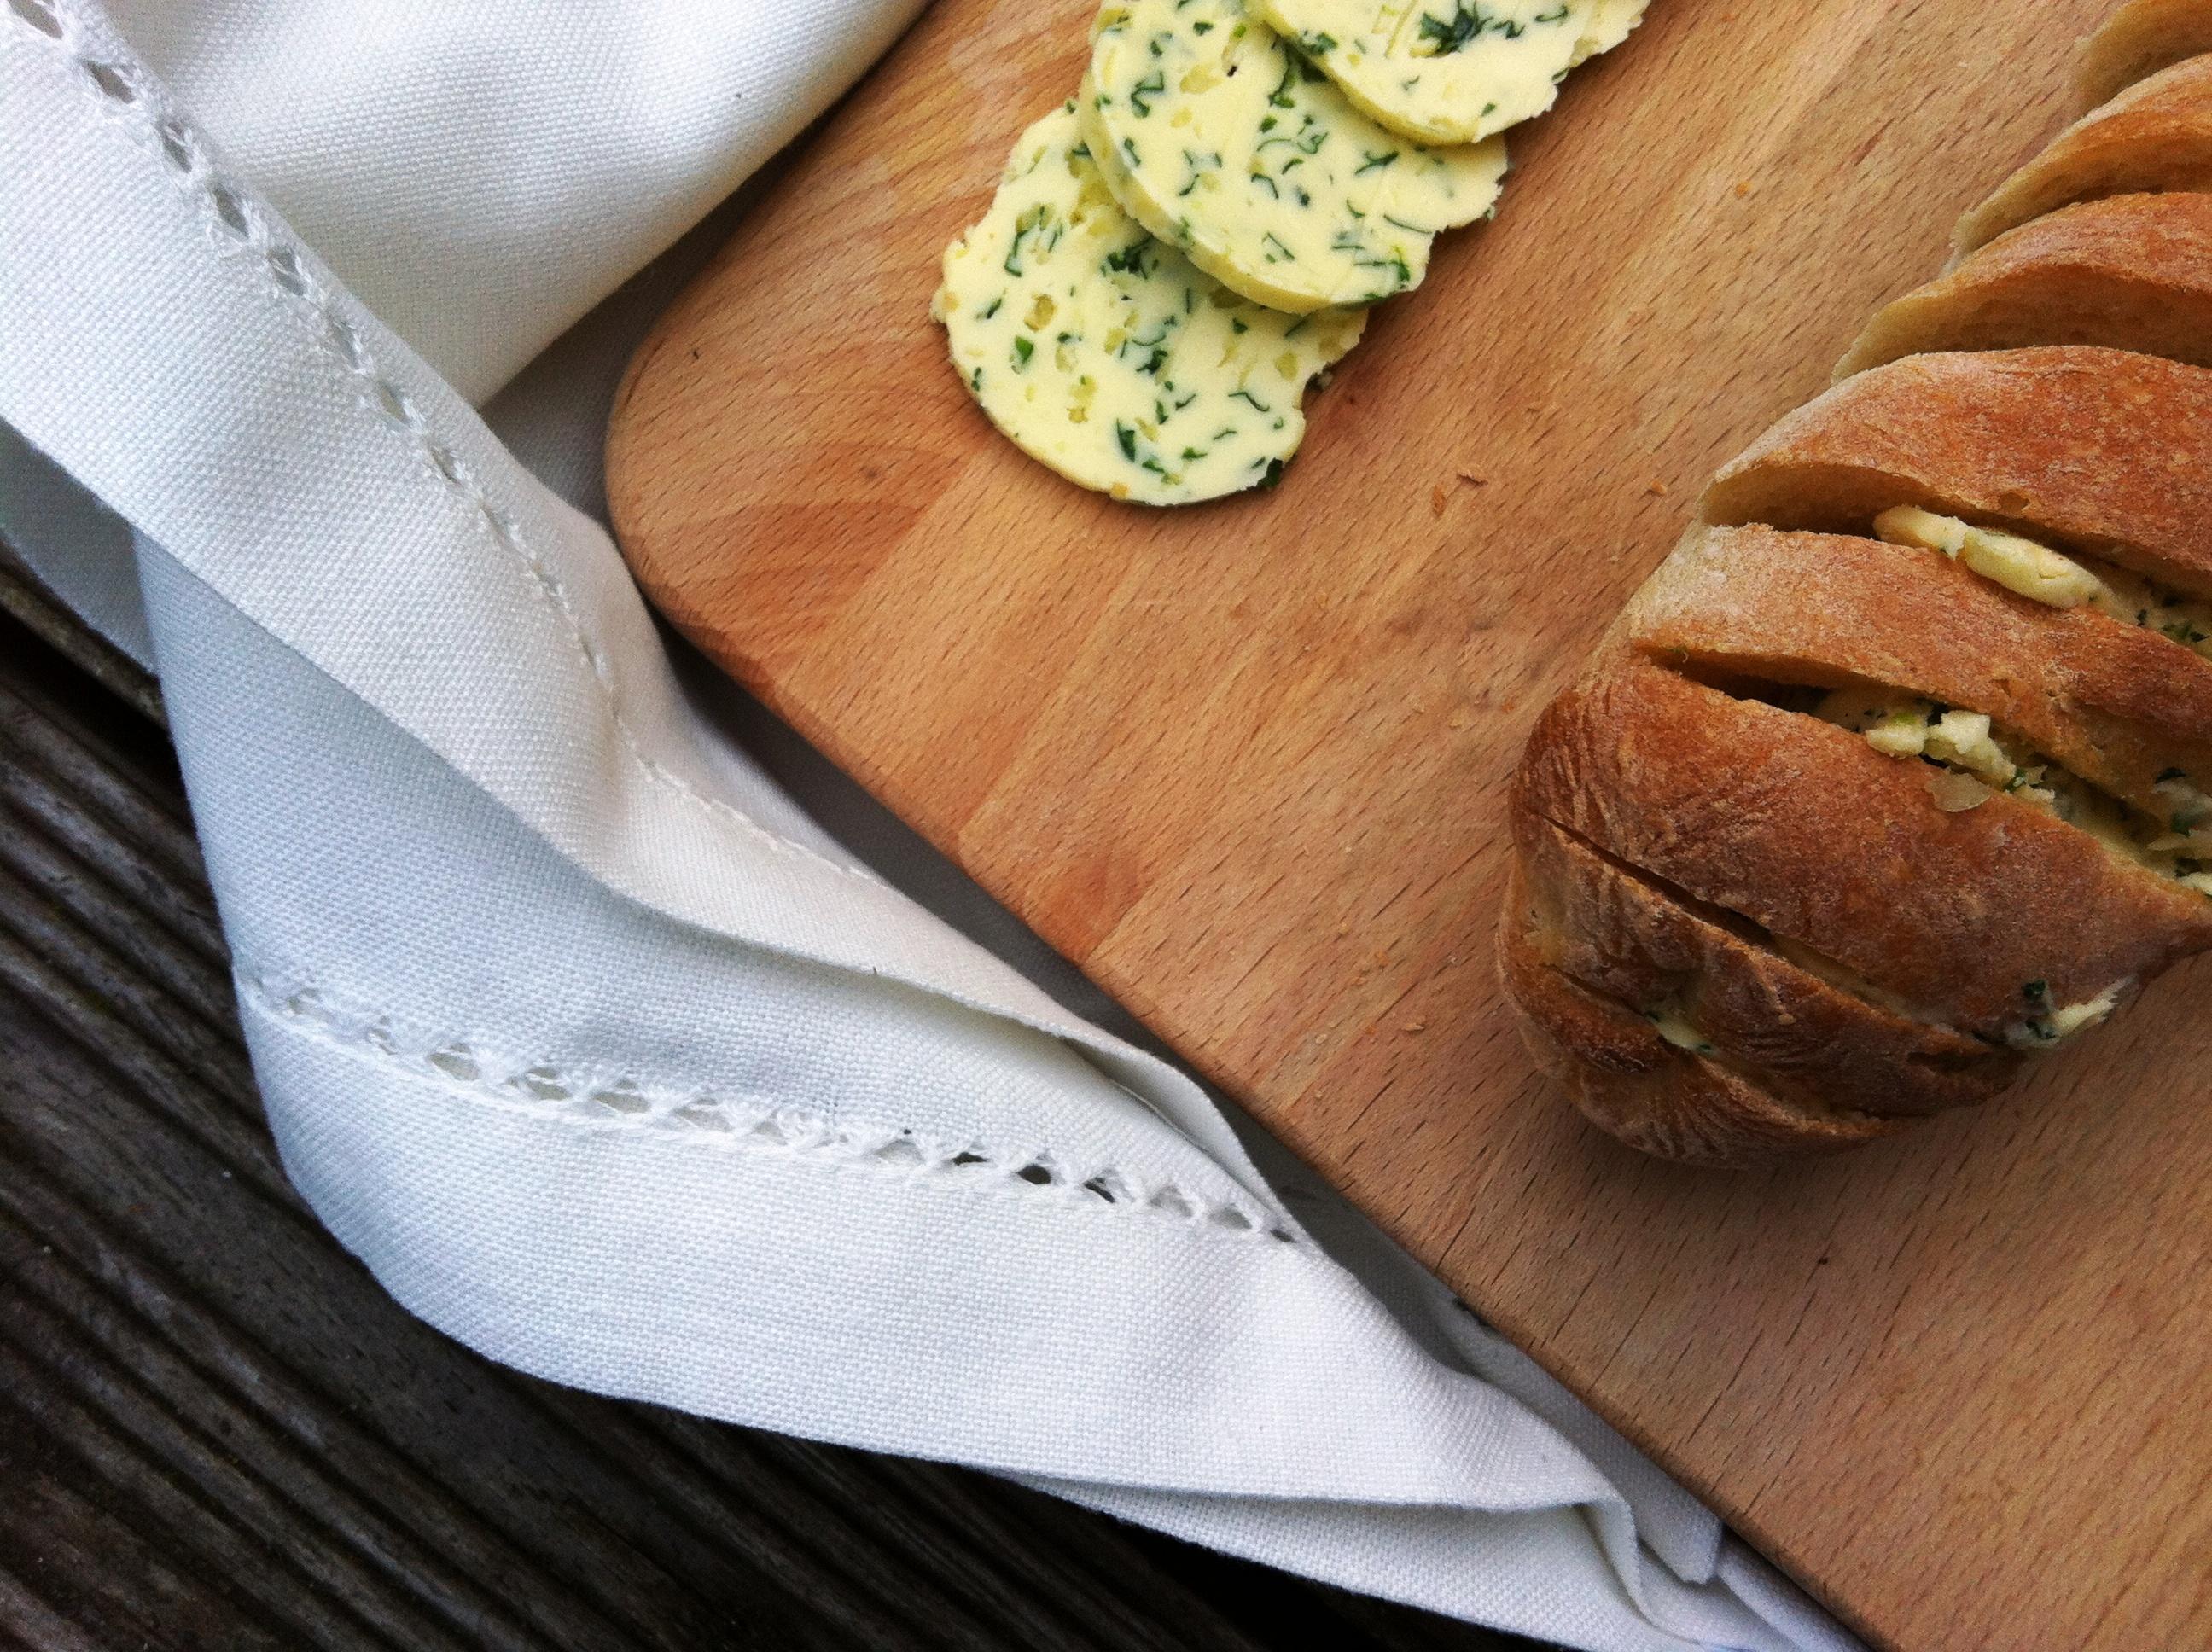 butter Archives - thelittleloaf